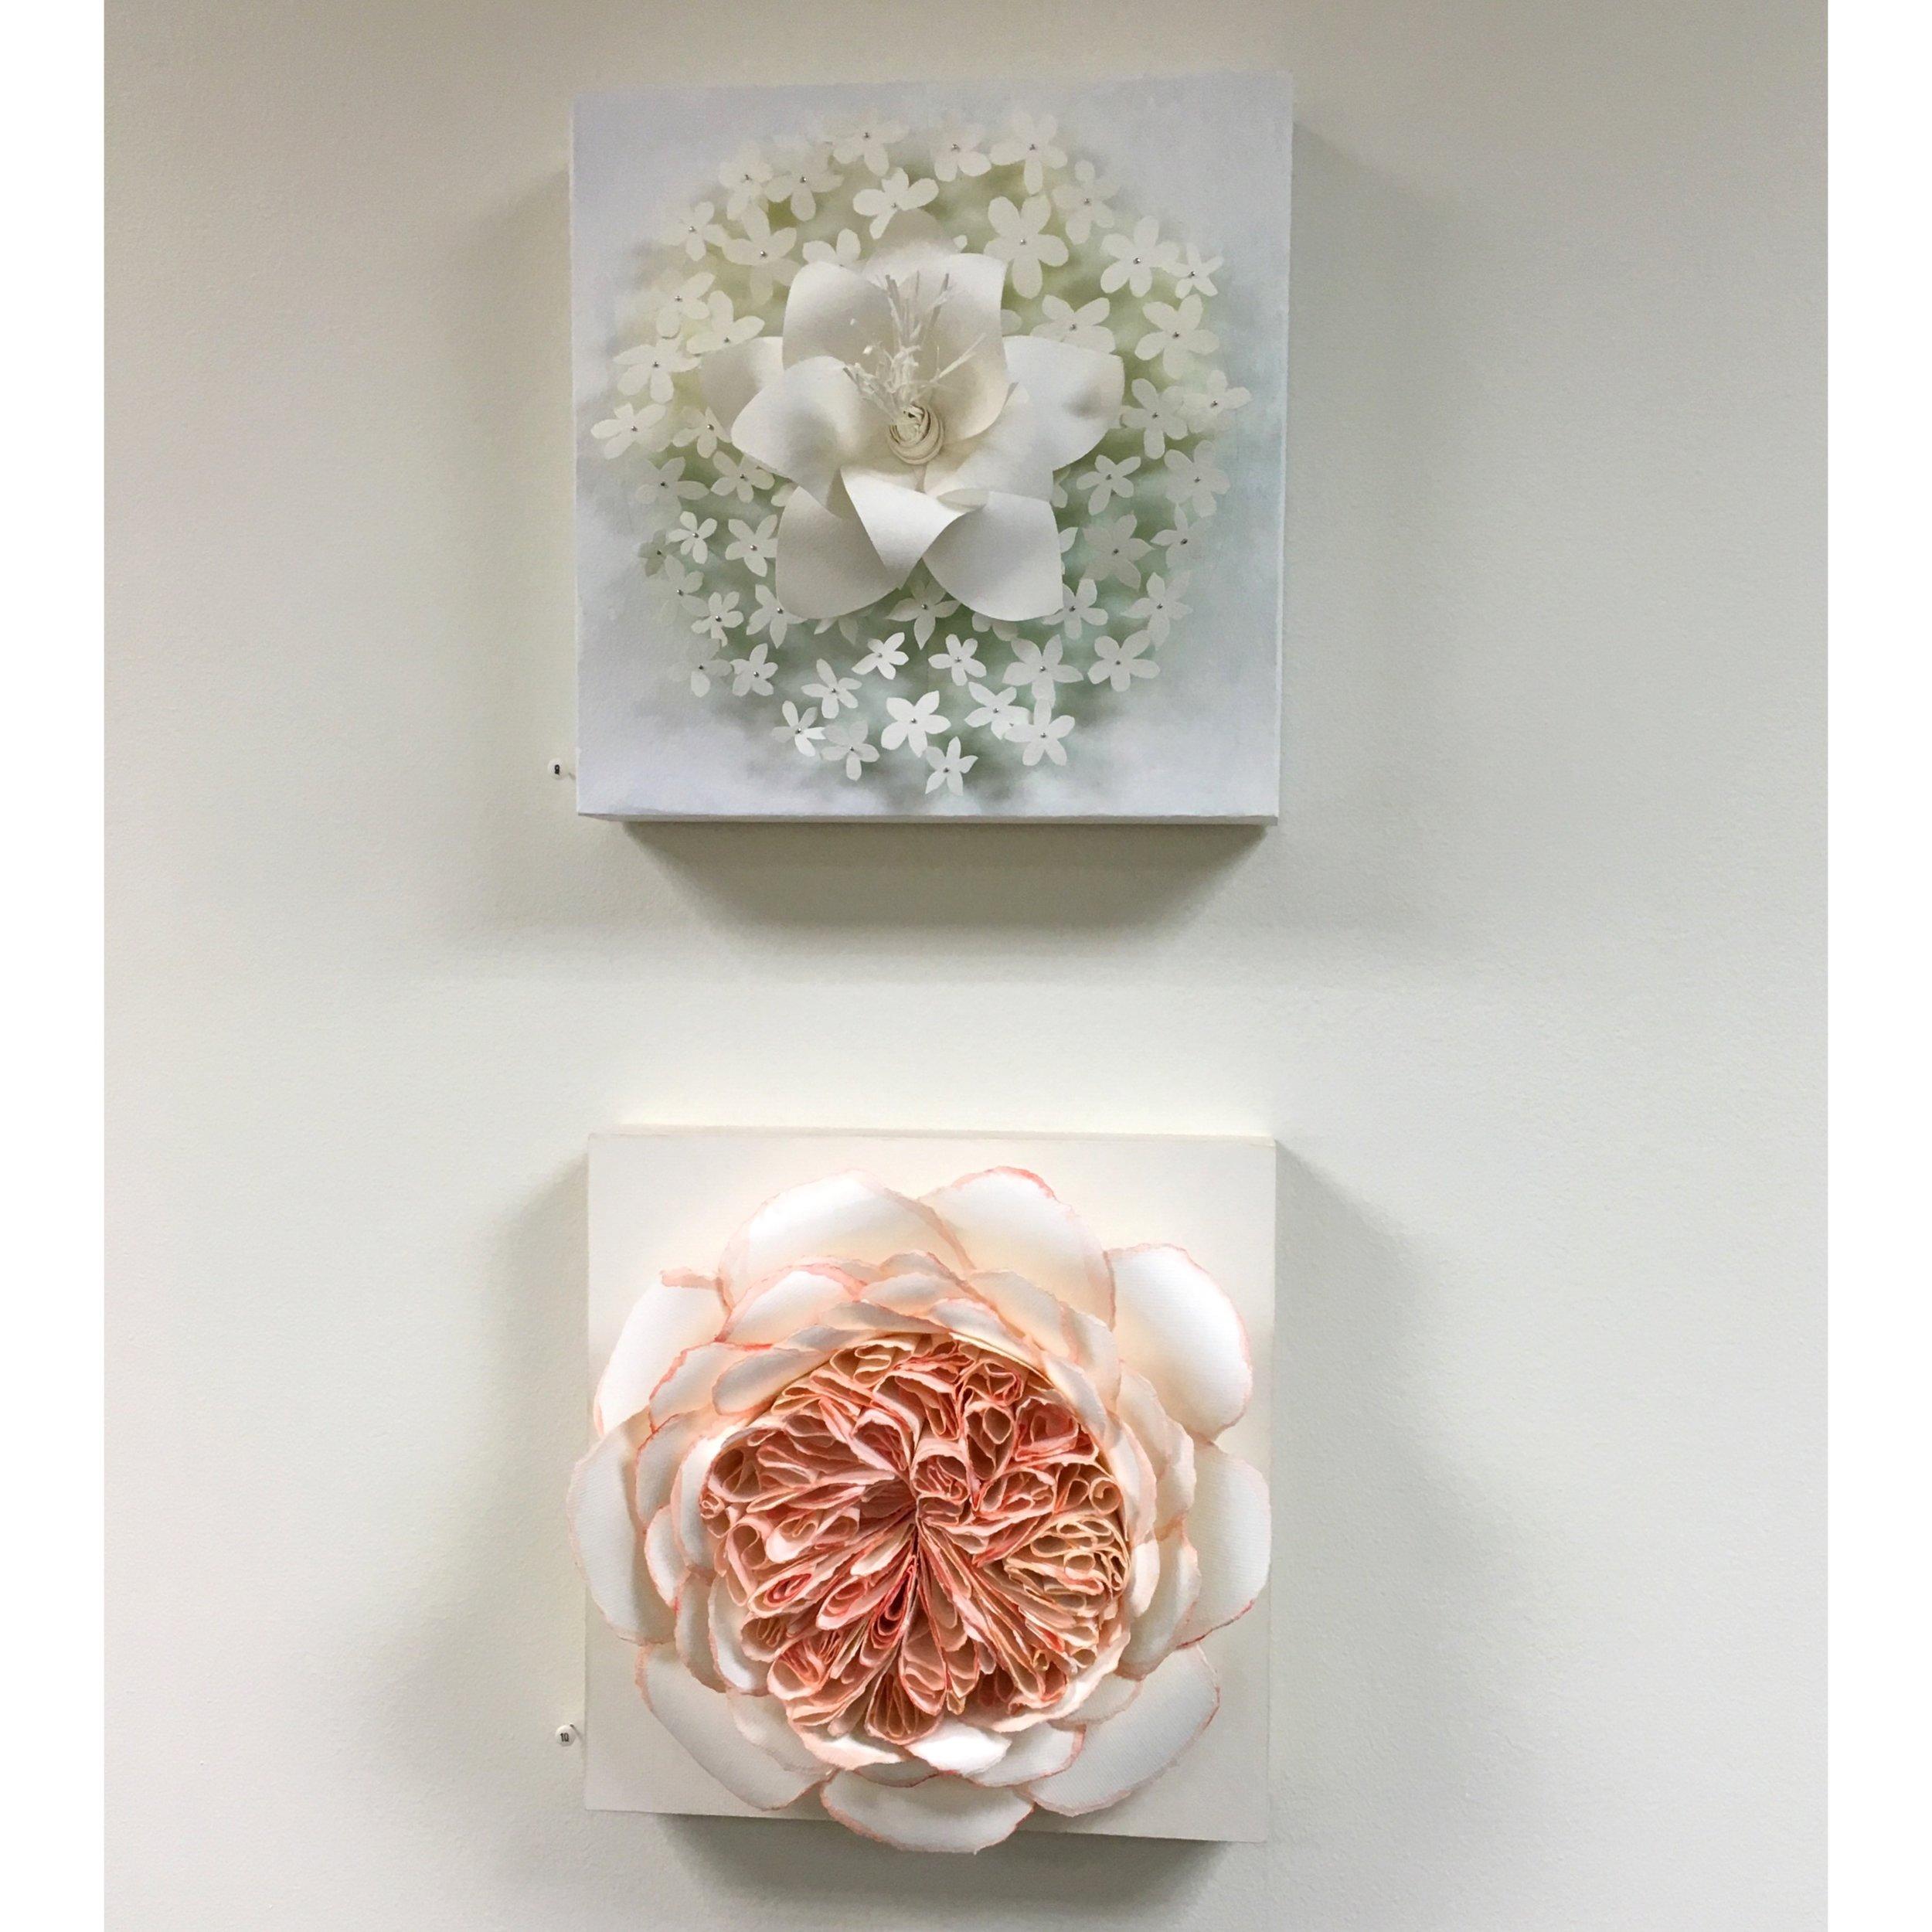 jess rose and spring mandala.JPG